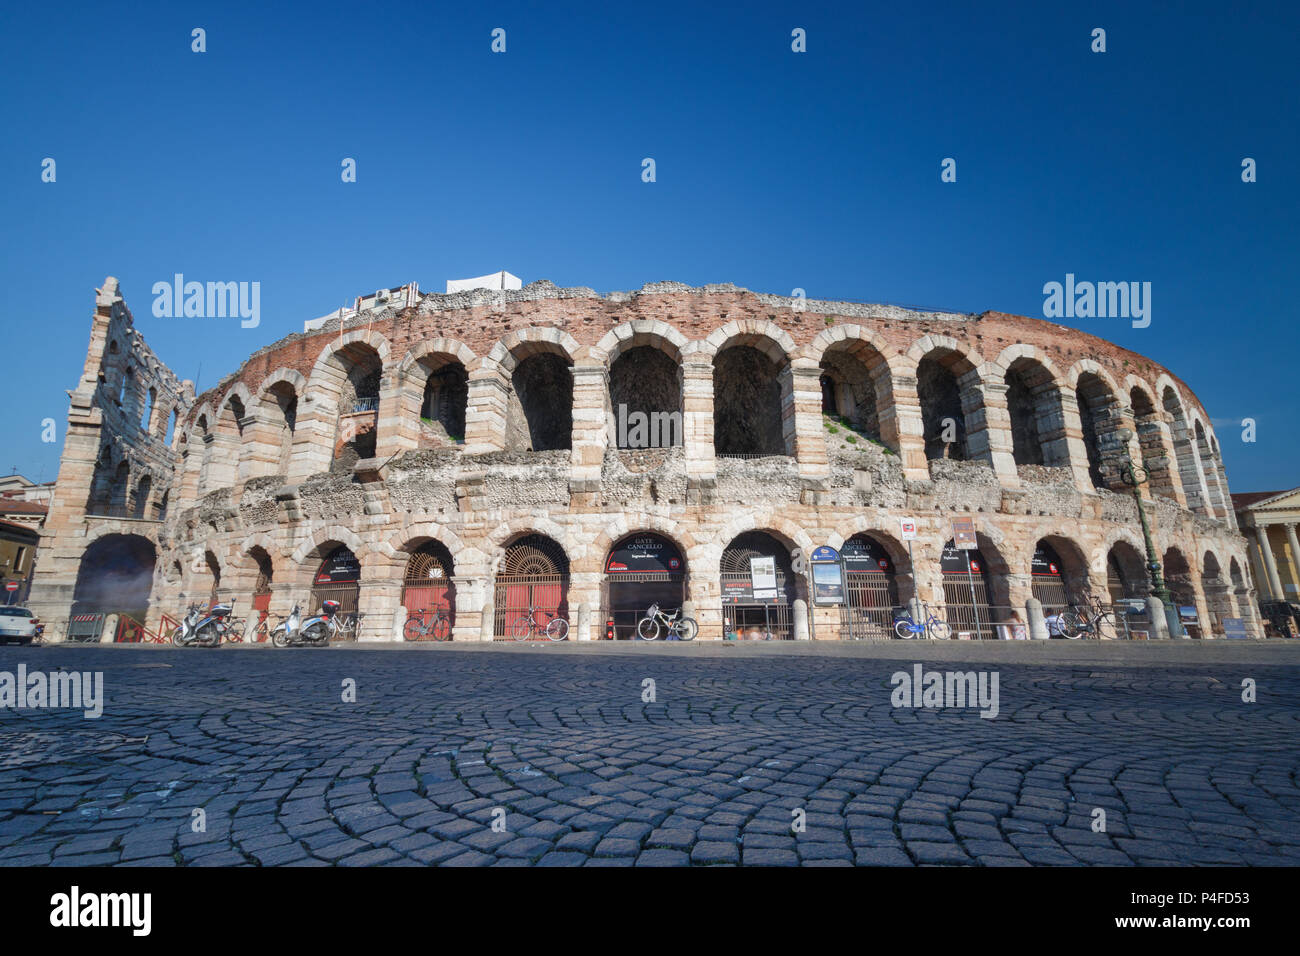 Verona, Italy – May 26, 2017: Outside view of Verona Arena from Piazza Bra, an ancient roman amphitheatre (Arena di Verona) - Stock Image